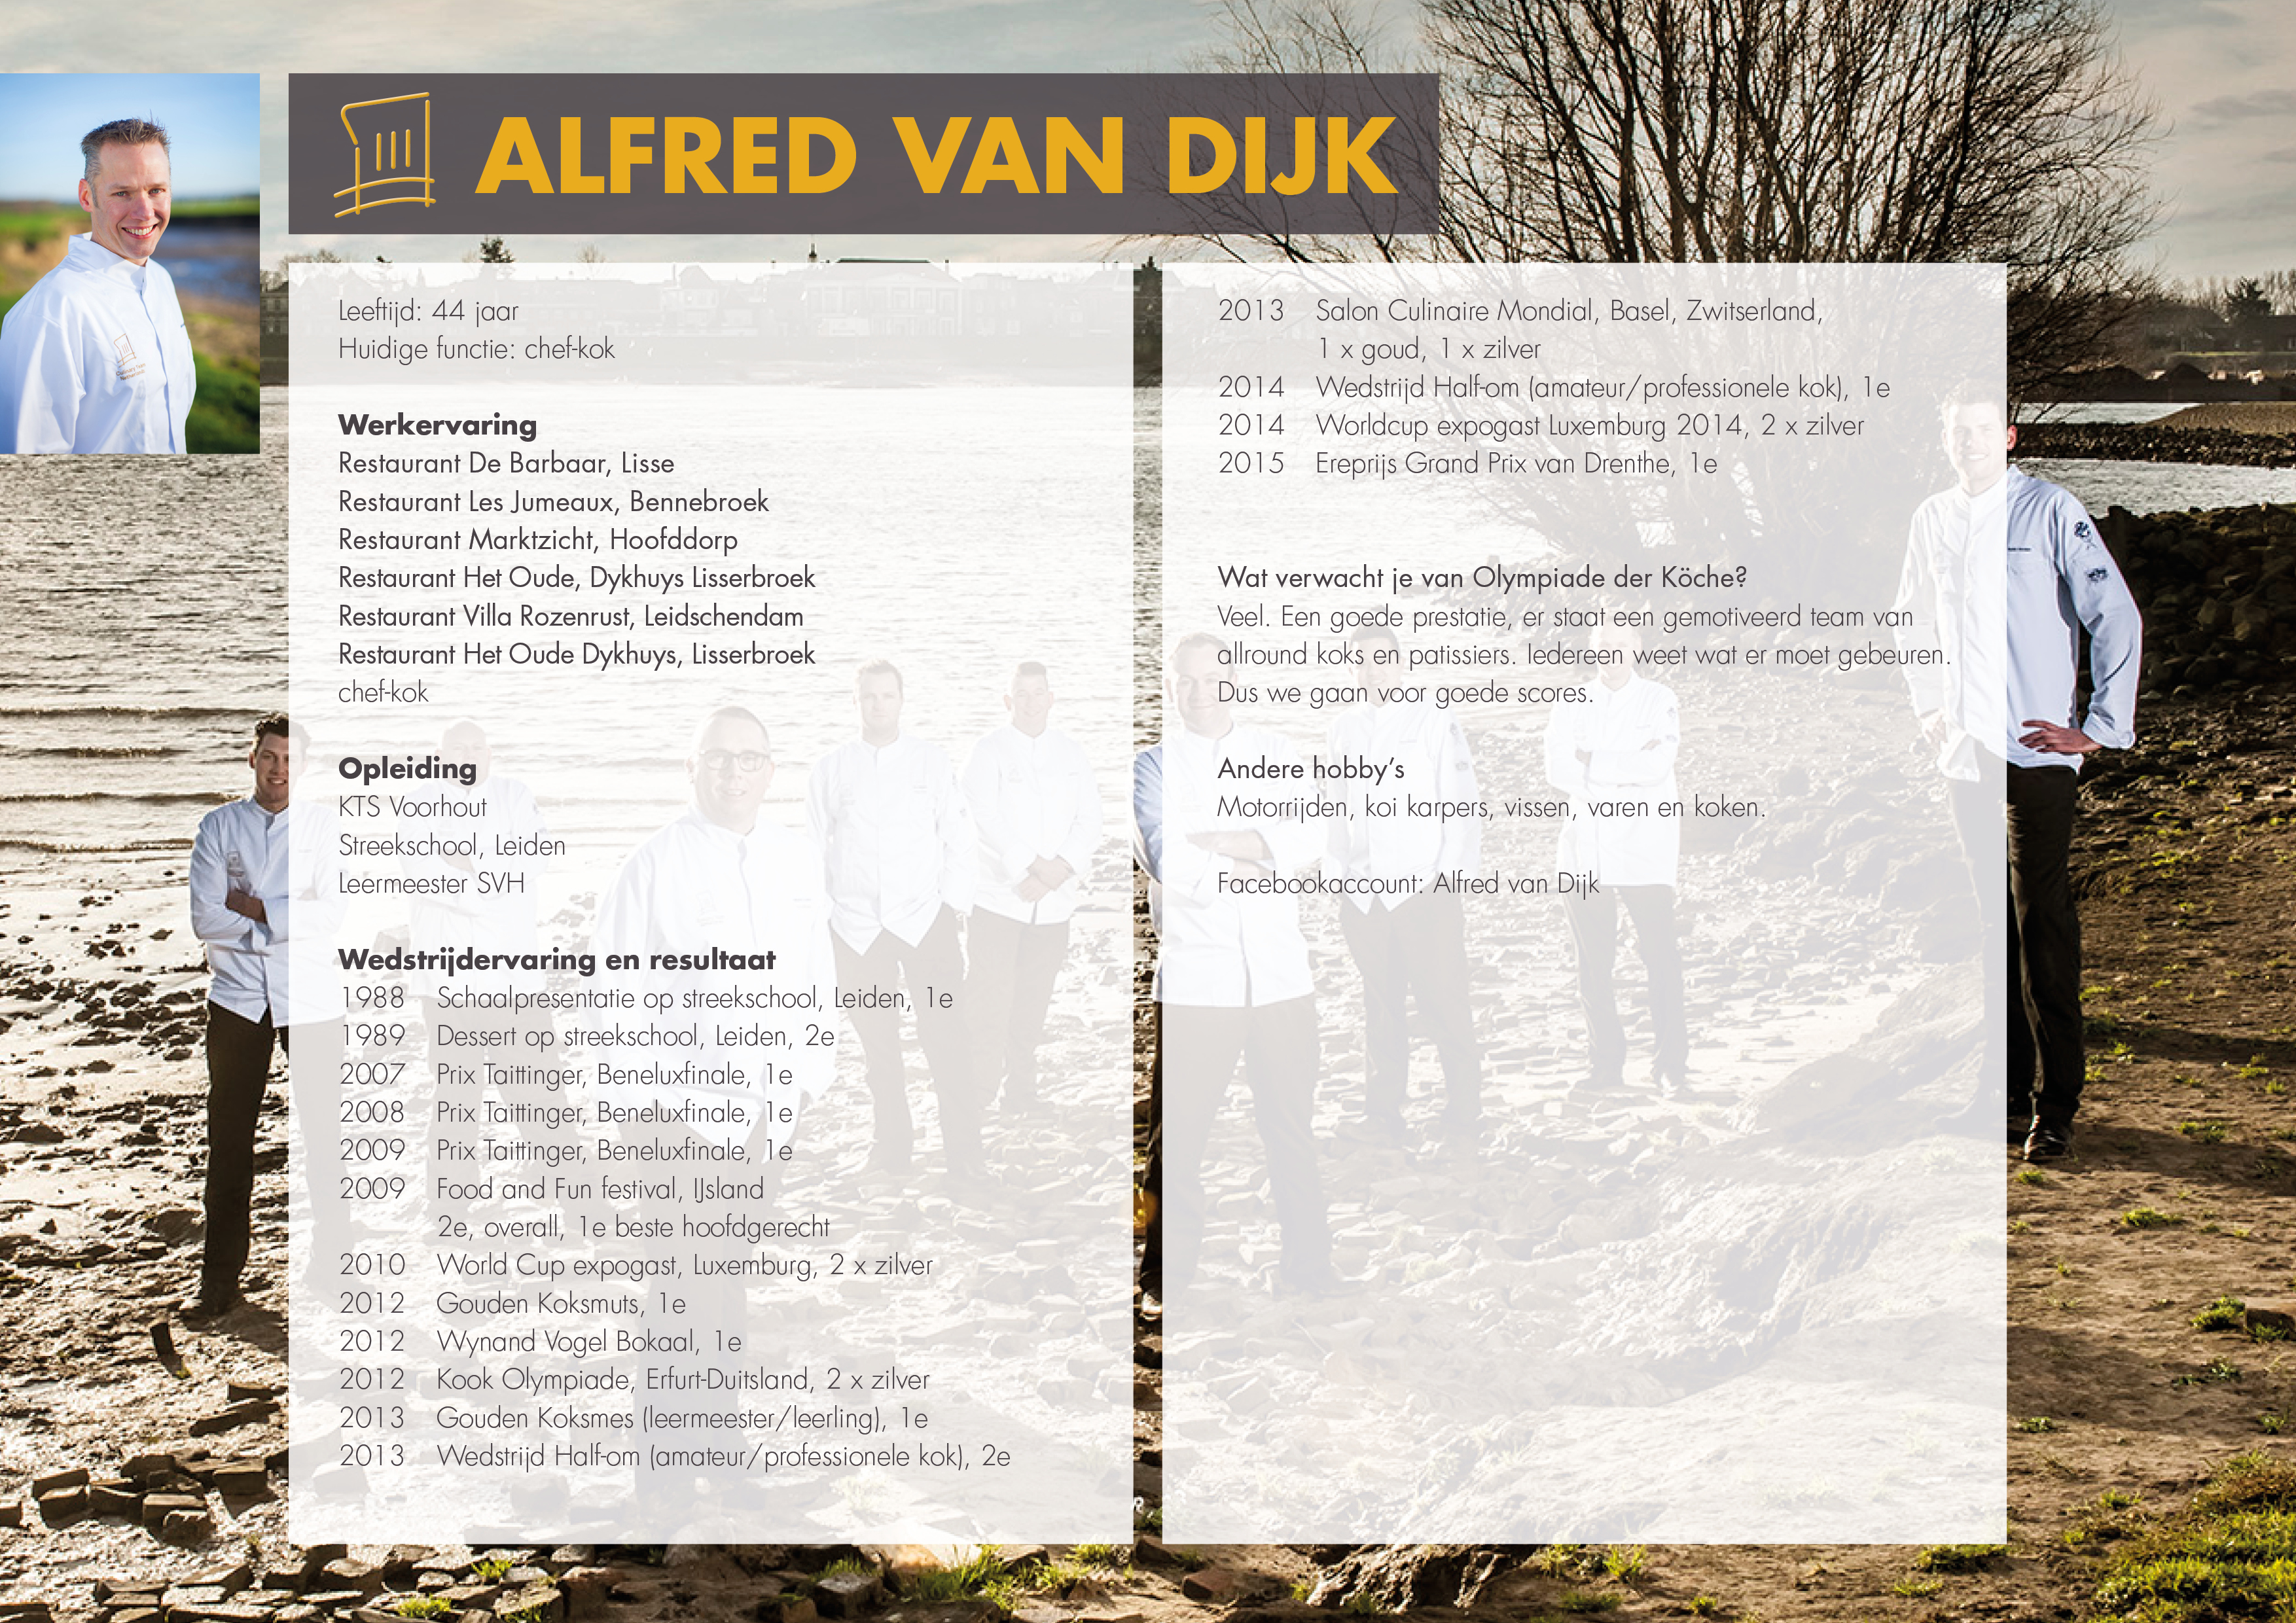 Alfred van Dijk